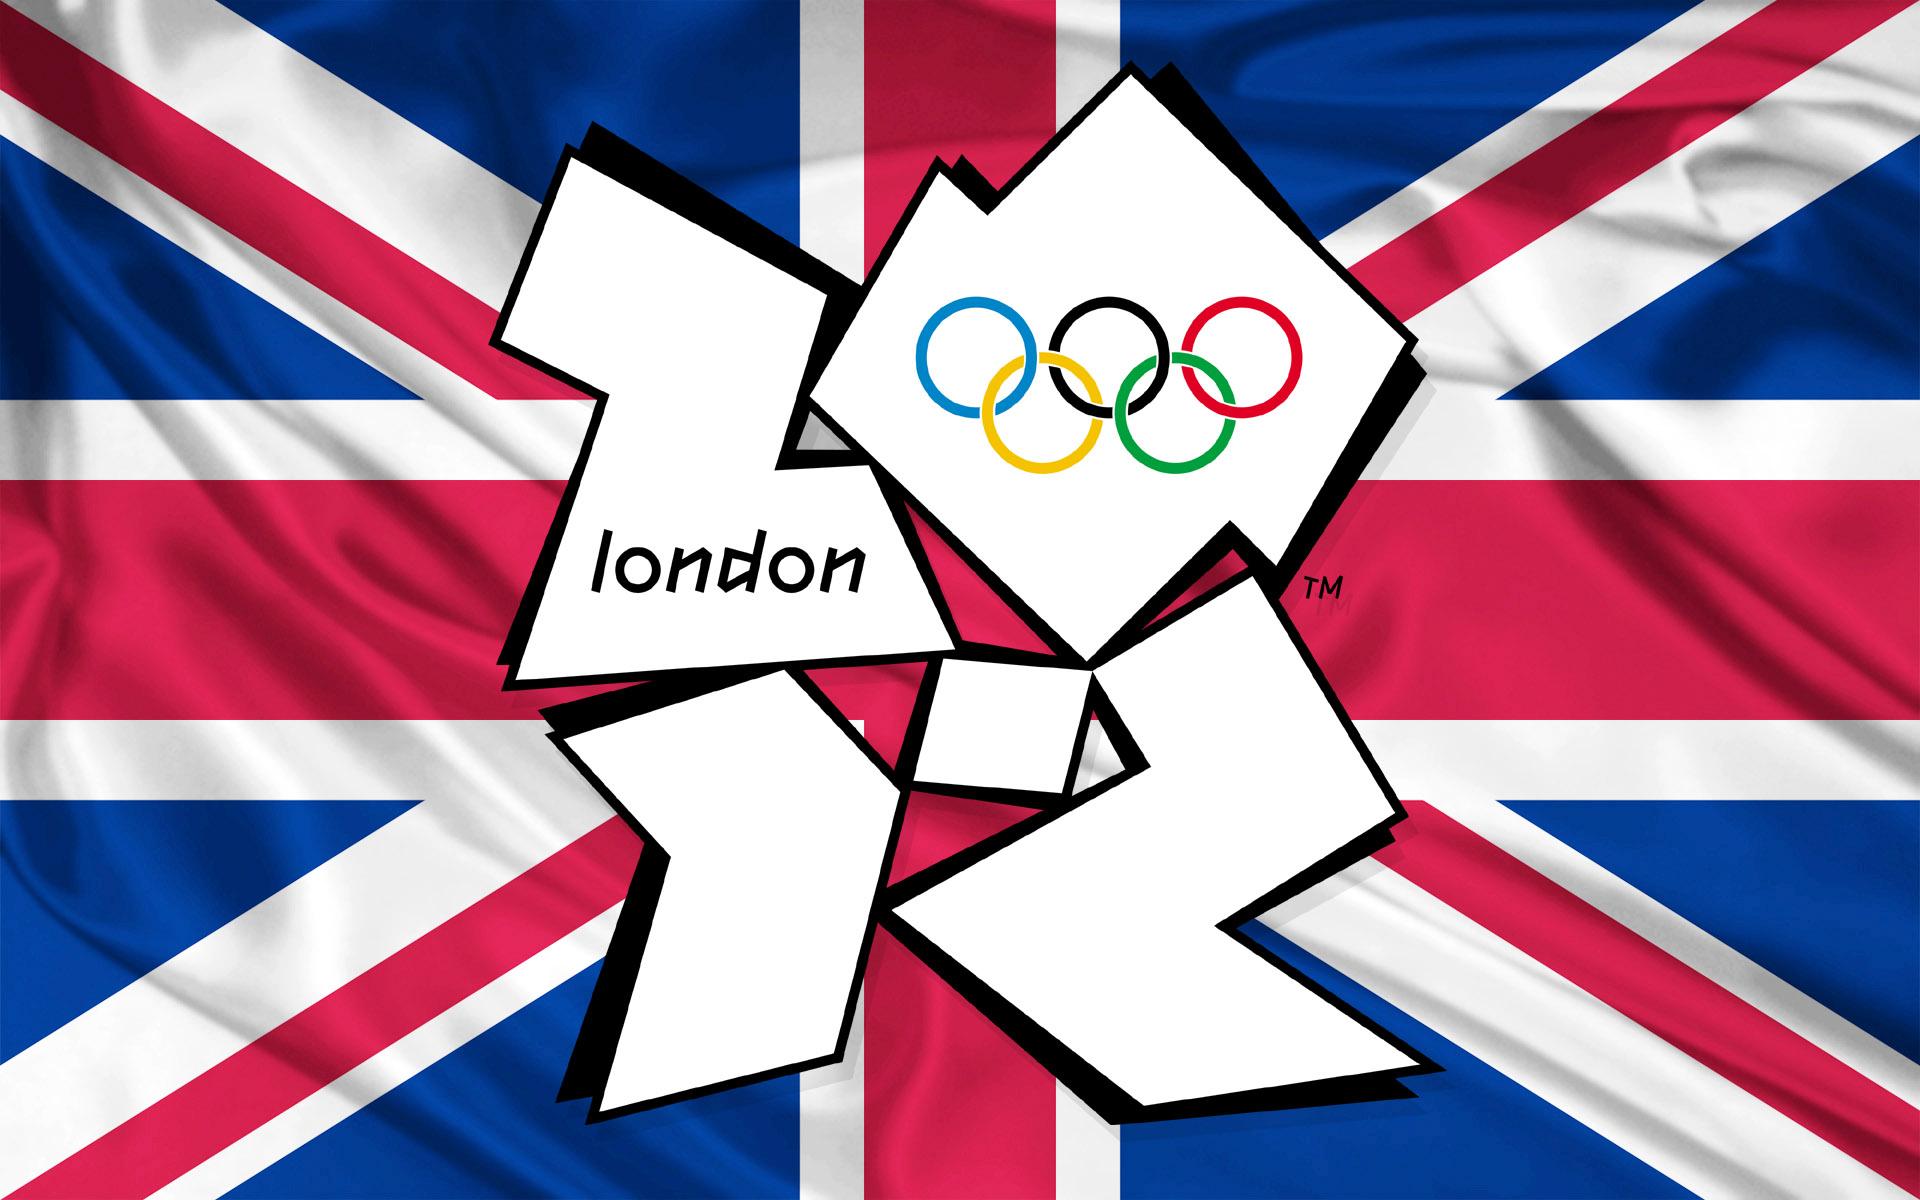 2012 London Olympics Logo With UK Flag Background 1920x1200 WIDE 1920x1200